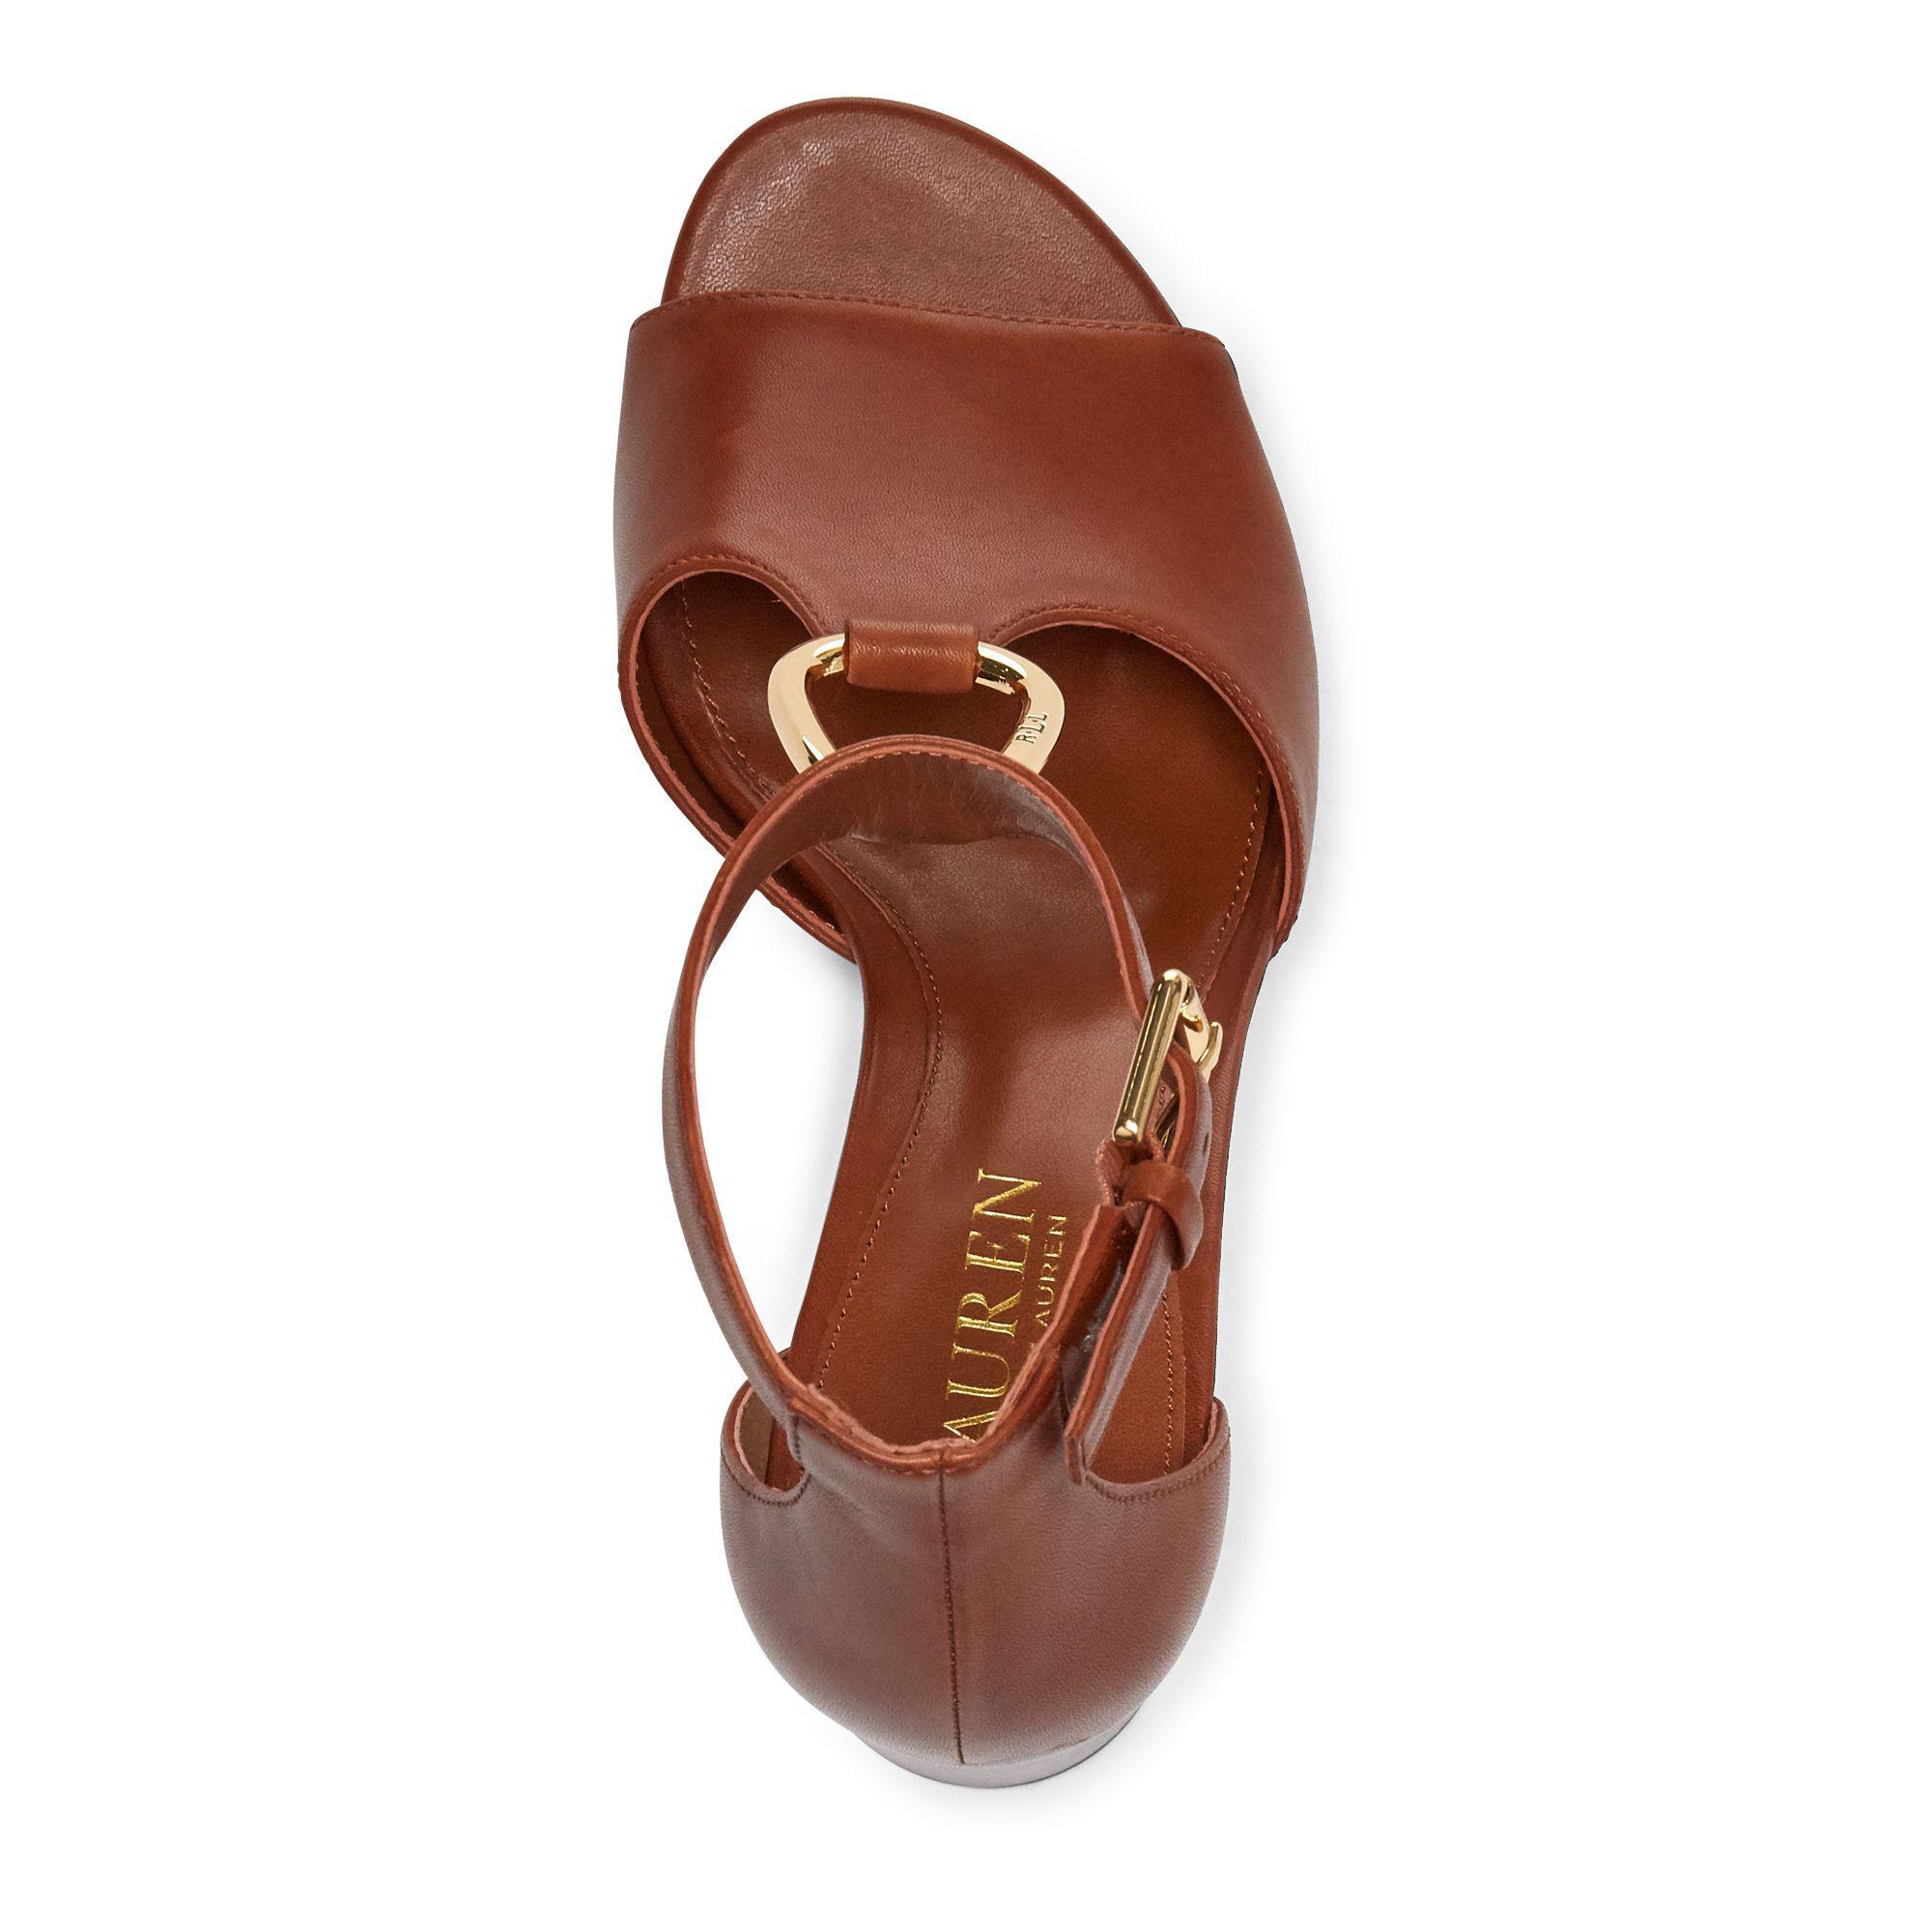 Ralph Lauren Elesia Leather Sandal in